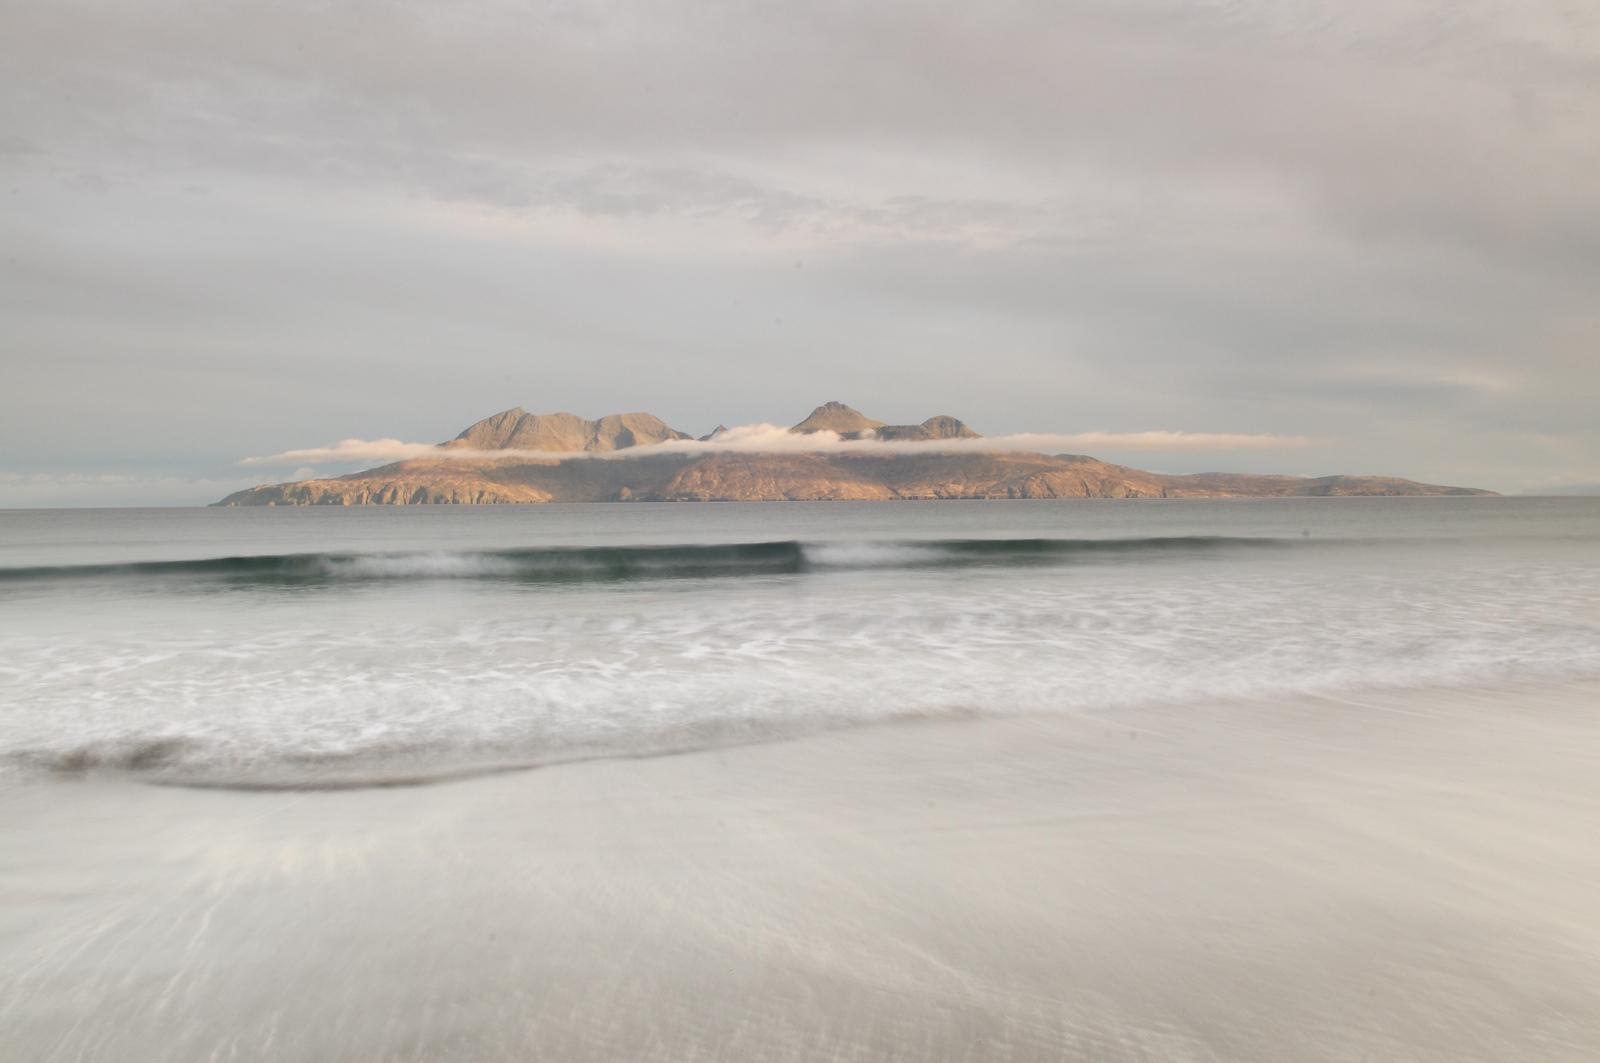 Rhum sunrise (from Bay of Largs on Eigg)